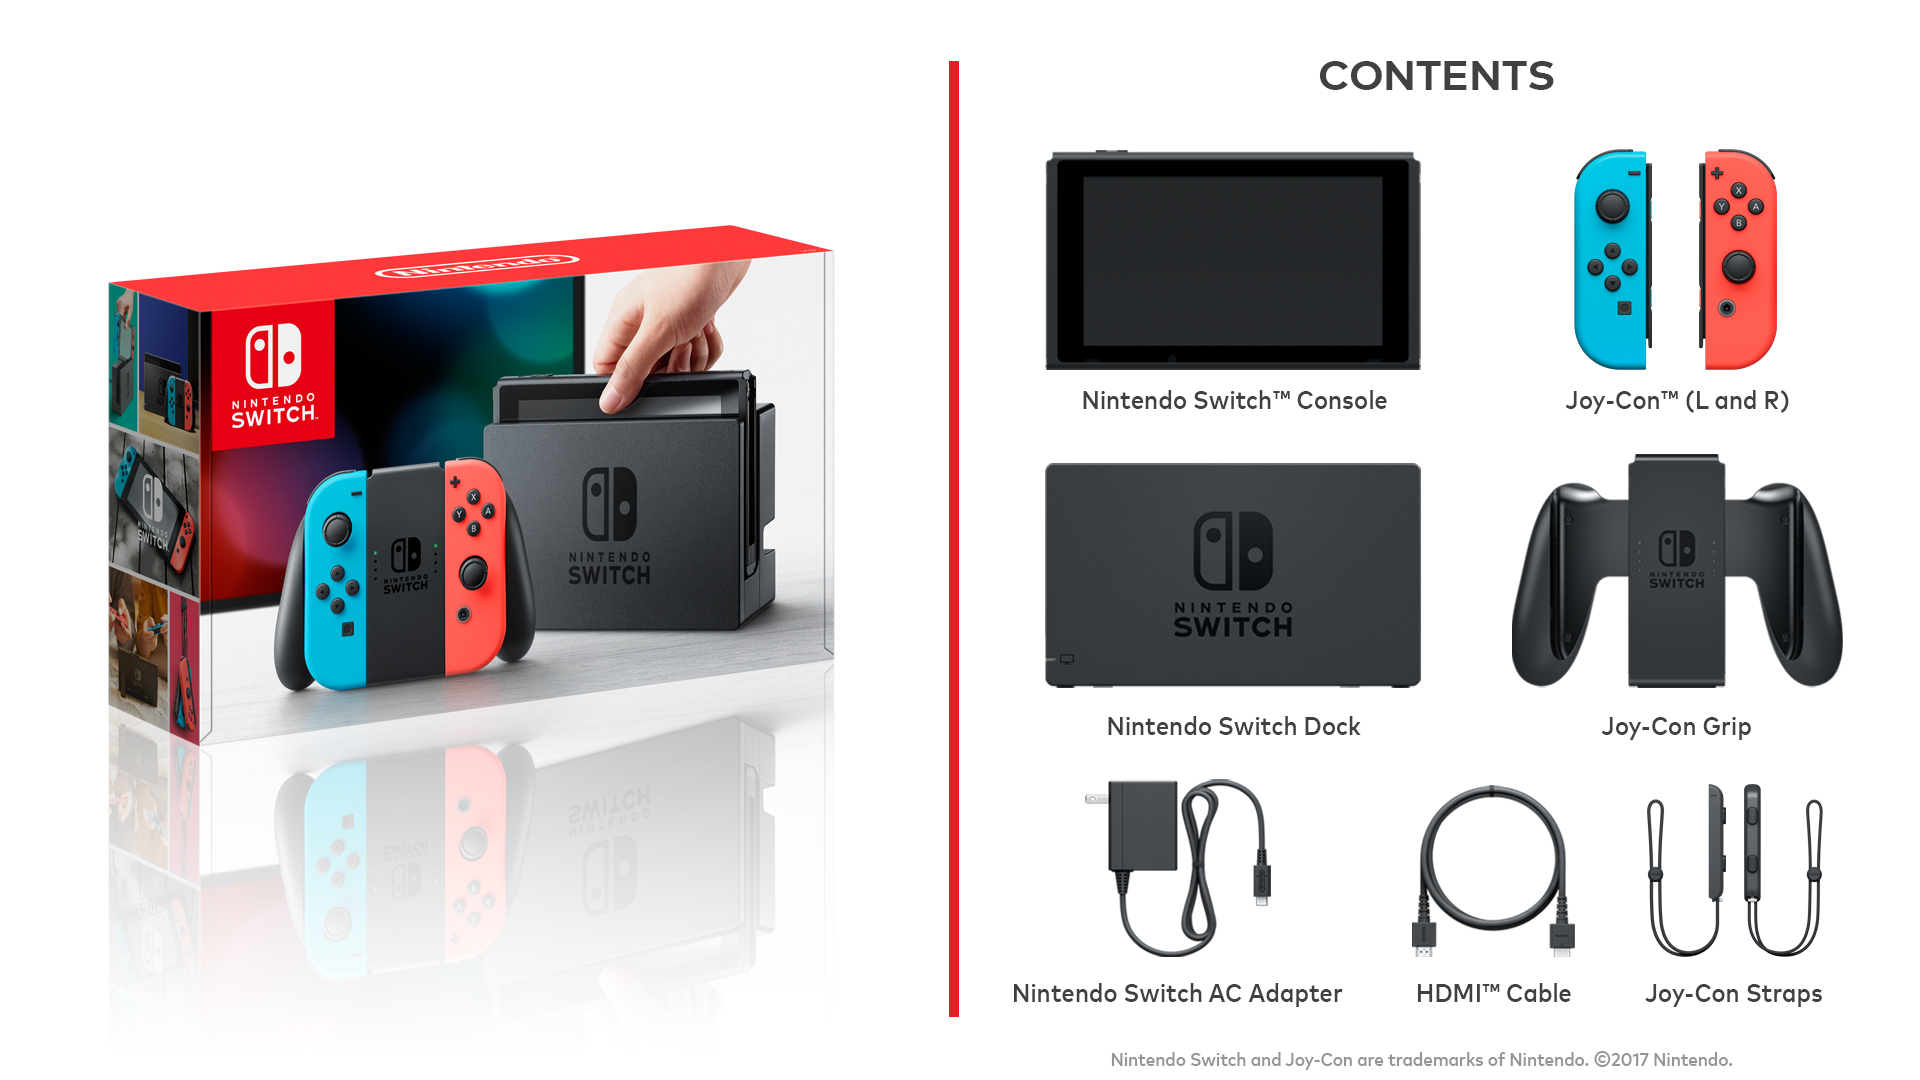 Le contenu de la boîte de la Nintendo Switch